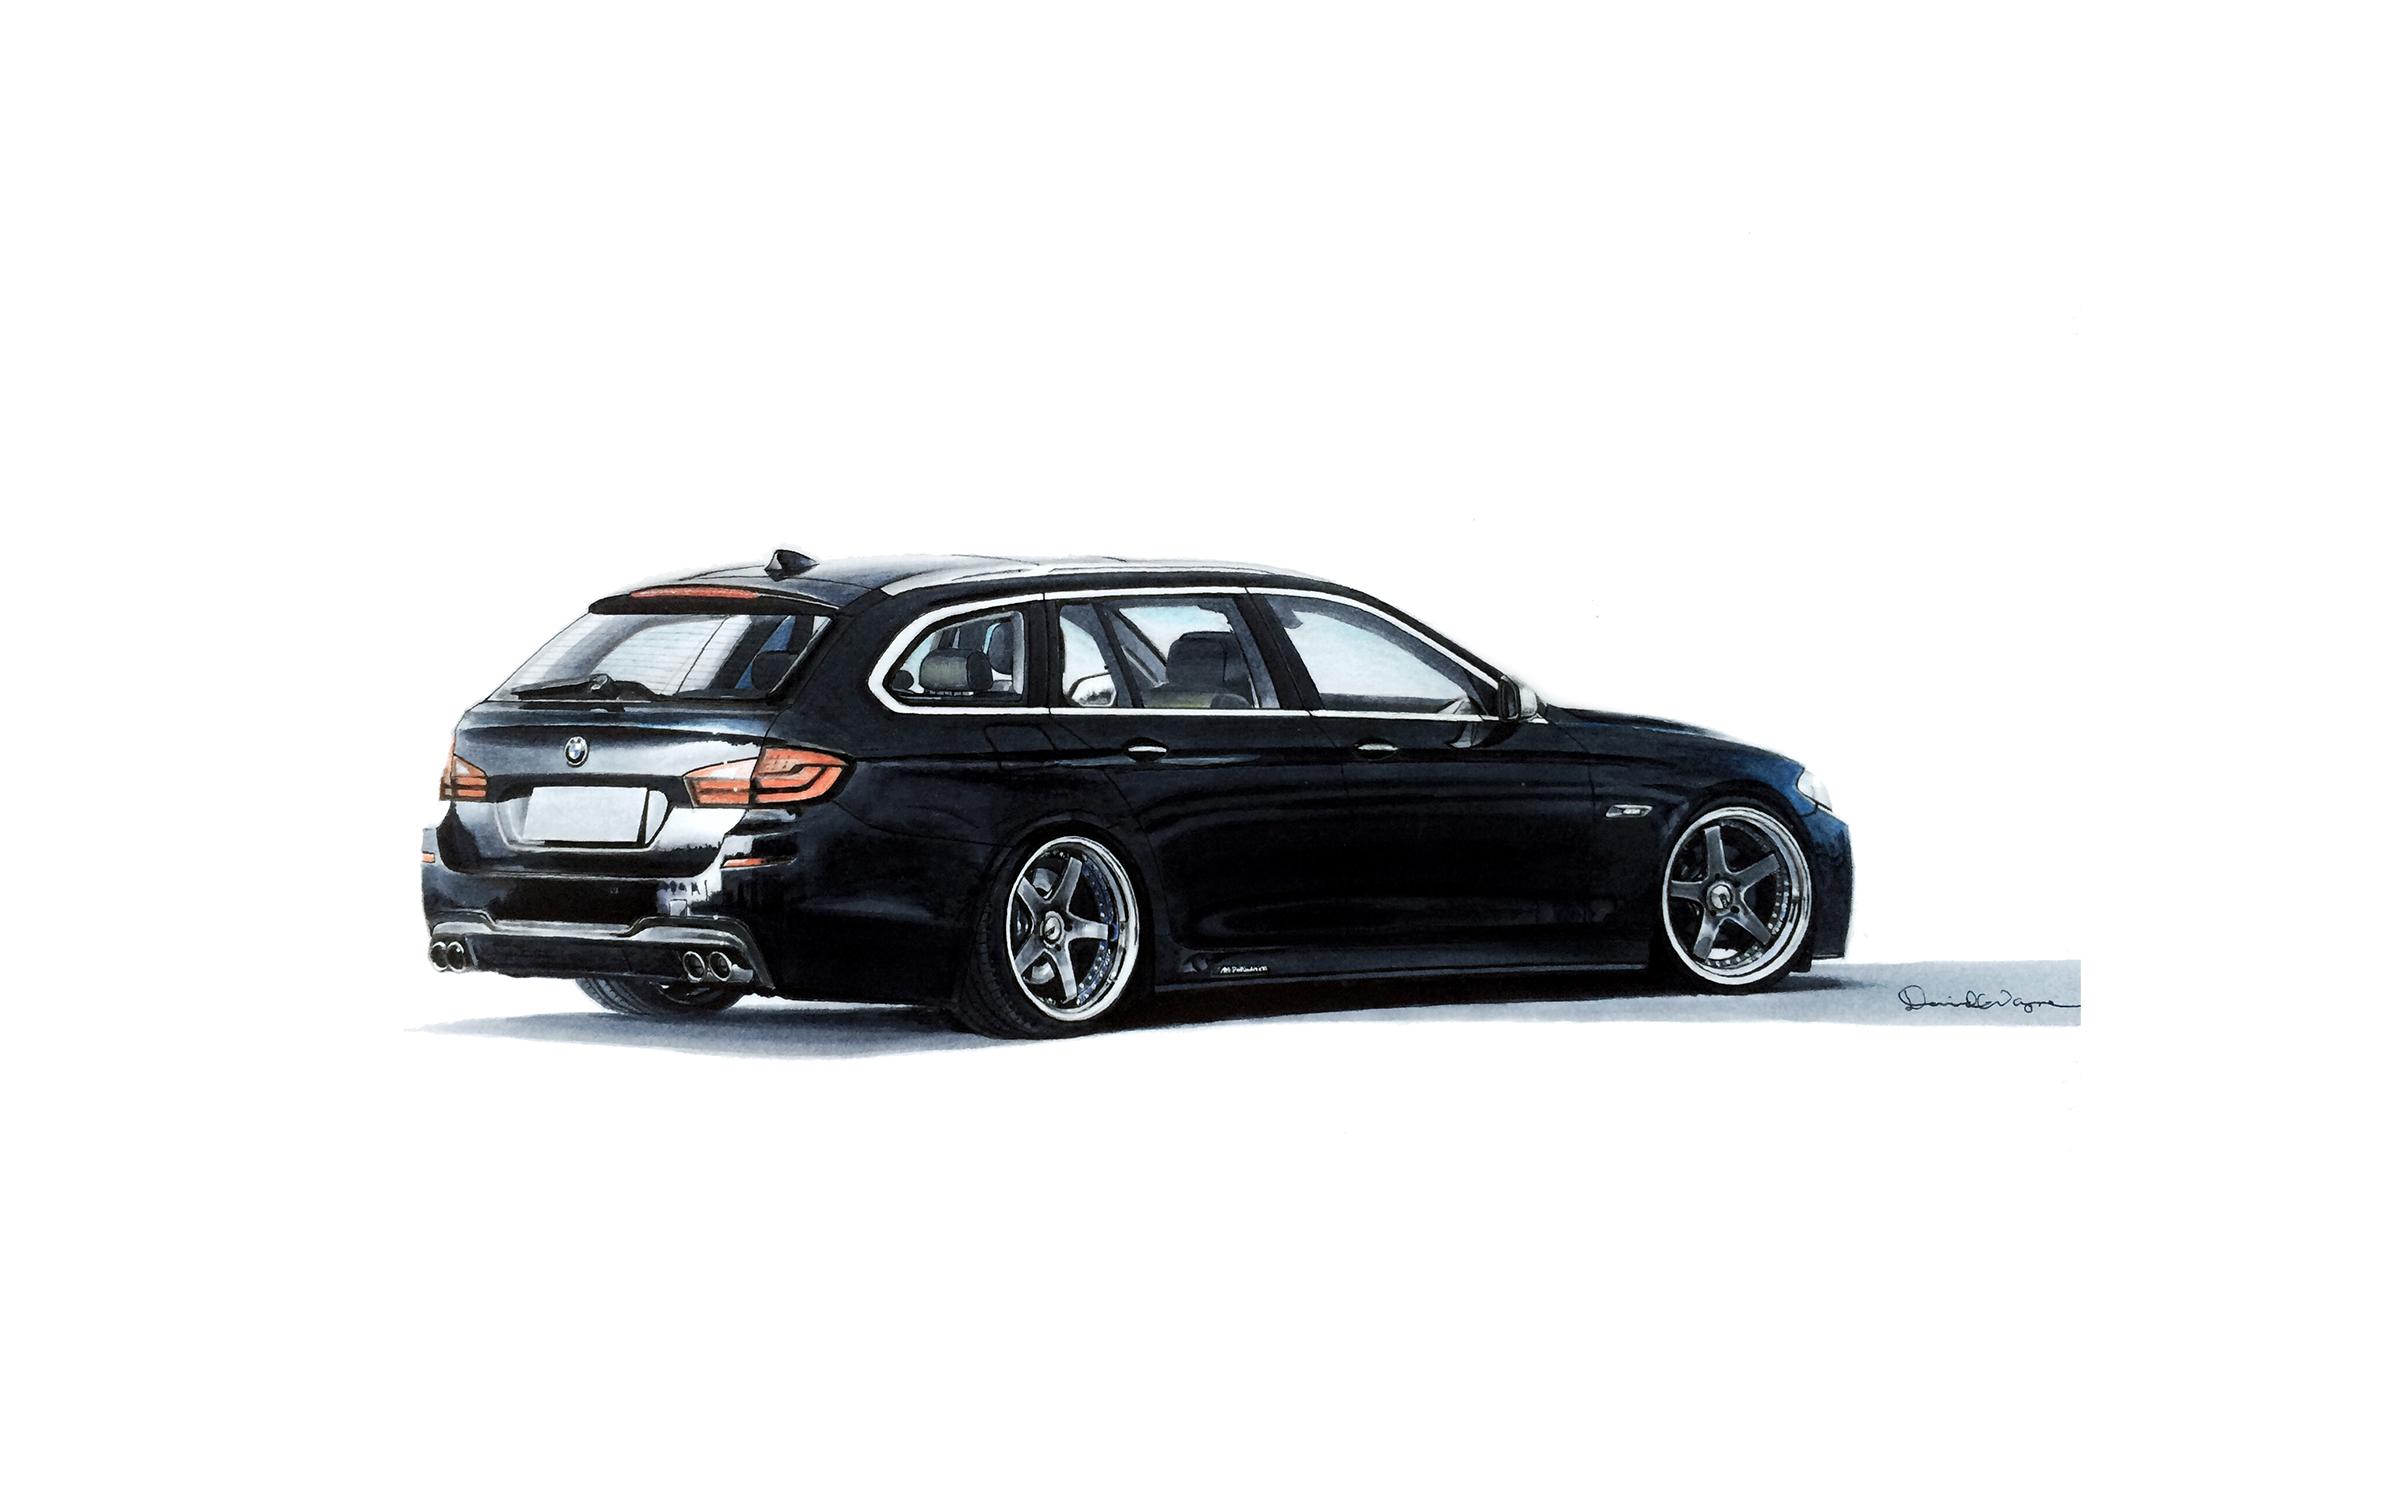 BMW 530i Touring (F11)